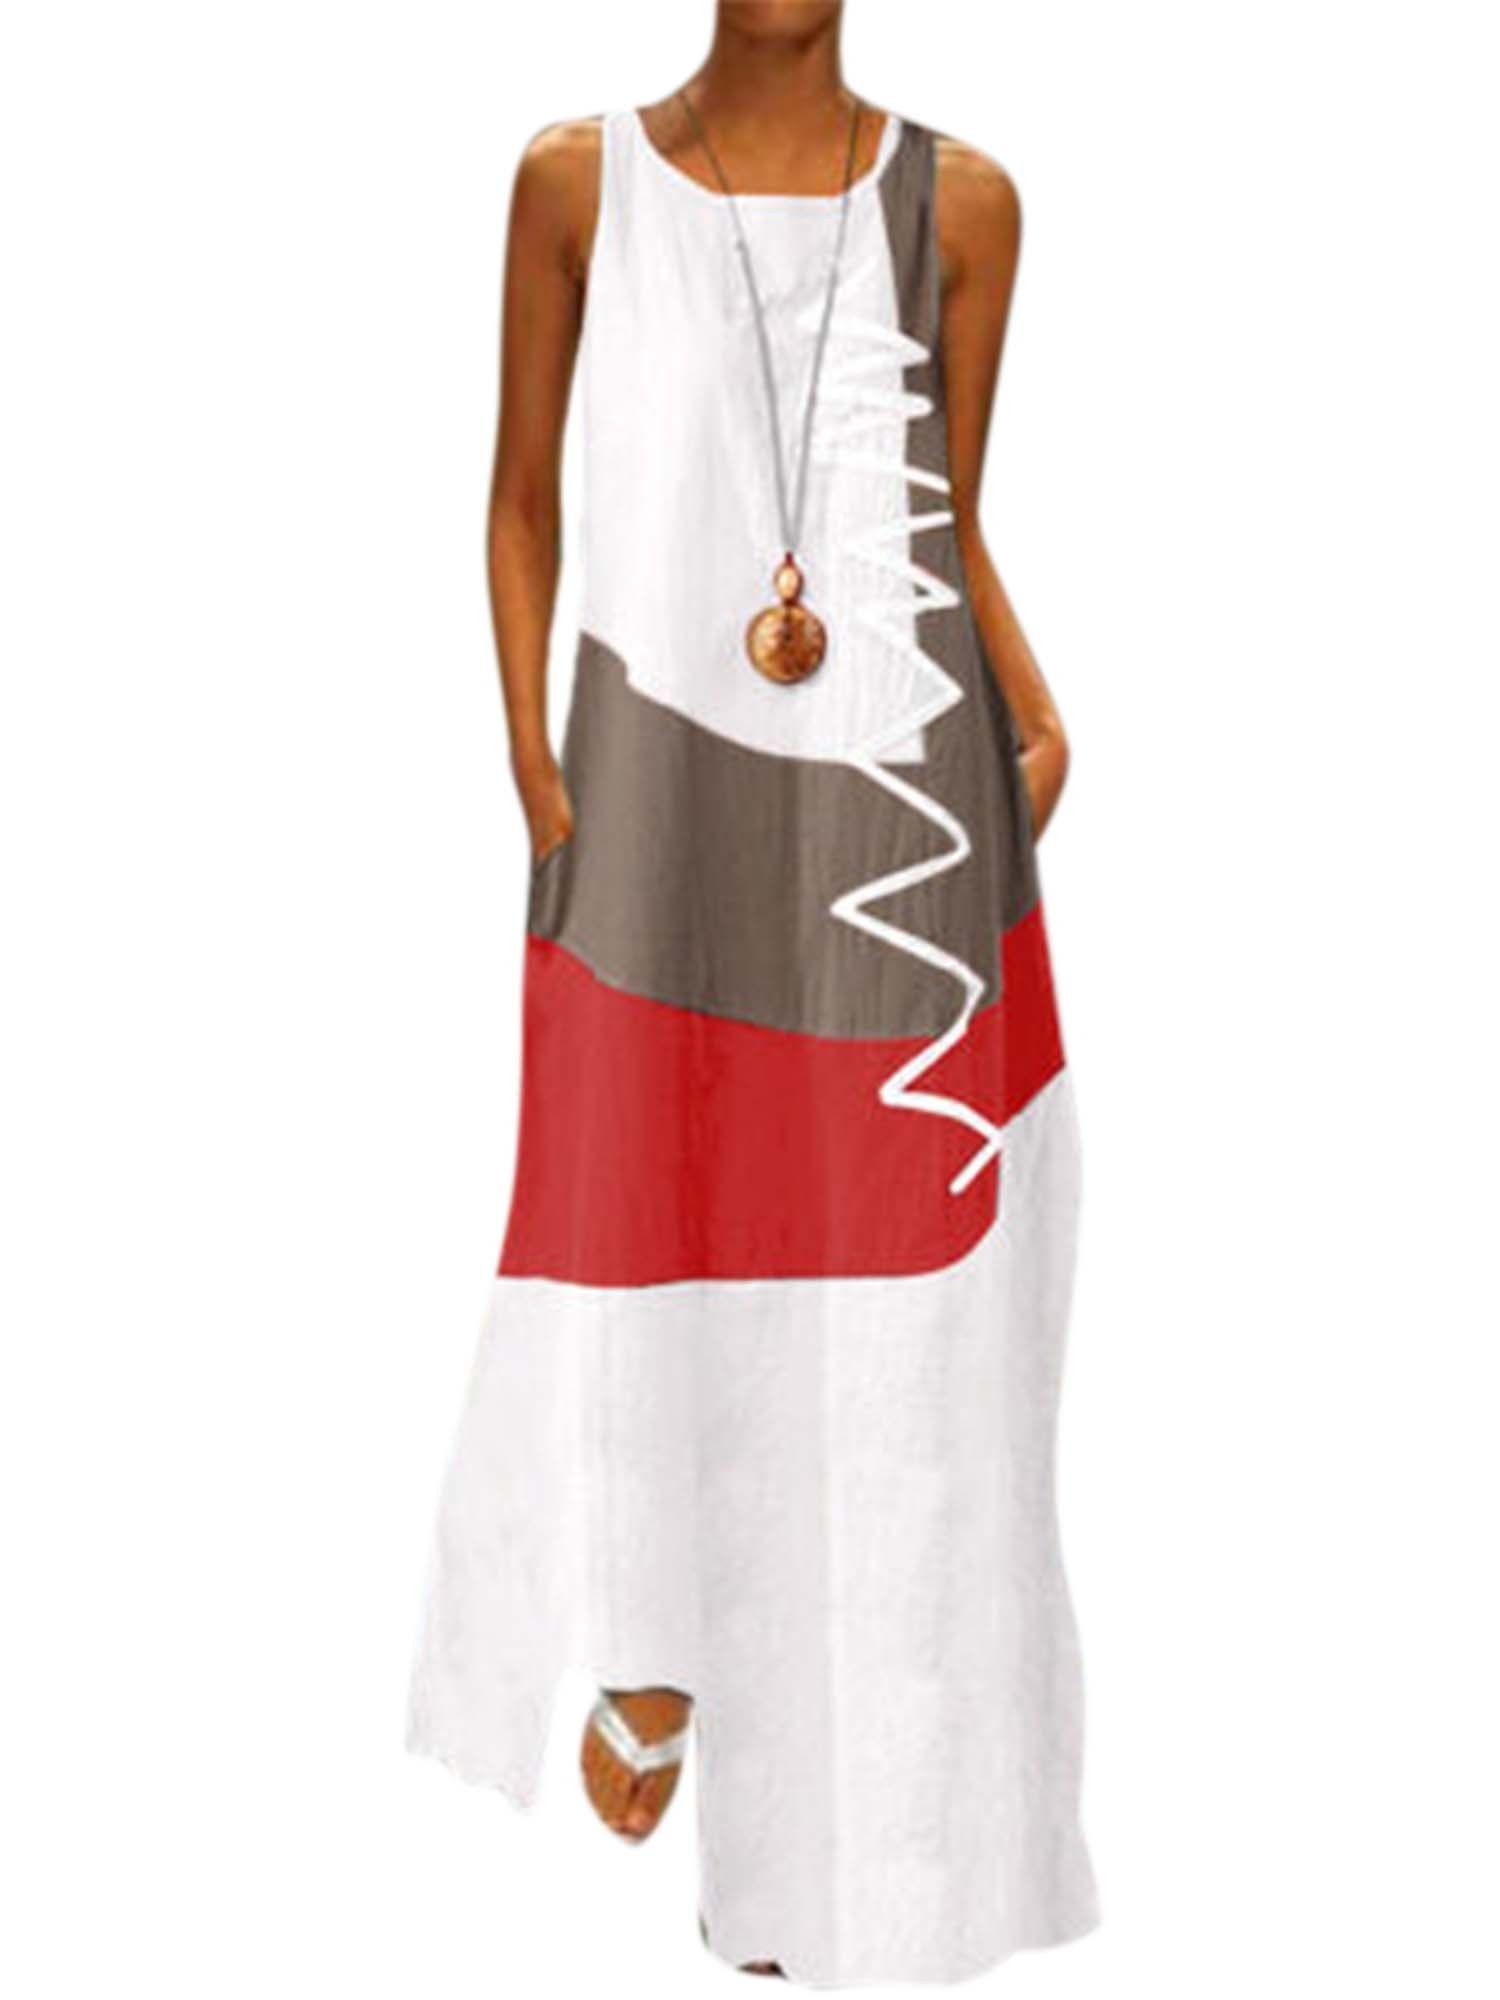 Lallc Women S Vintage Sleeveless Beach Maxi Dresses Plus Size Summer Loose Sundress Walmart Com In 2021 Color Block Tunics Womens Maxi Dresses 3xl Dress [ 2000 x 1500 Pixel ]